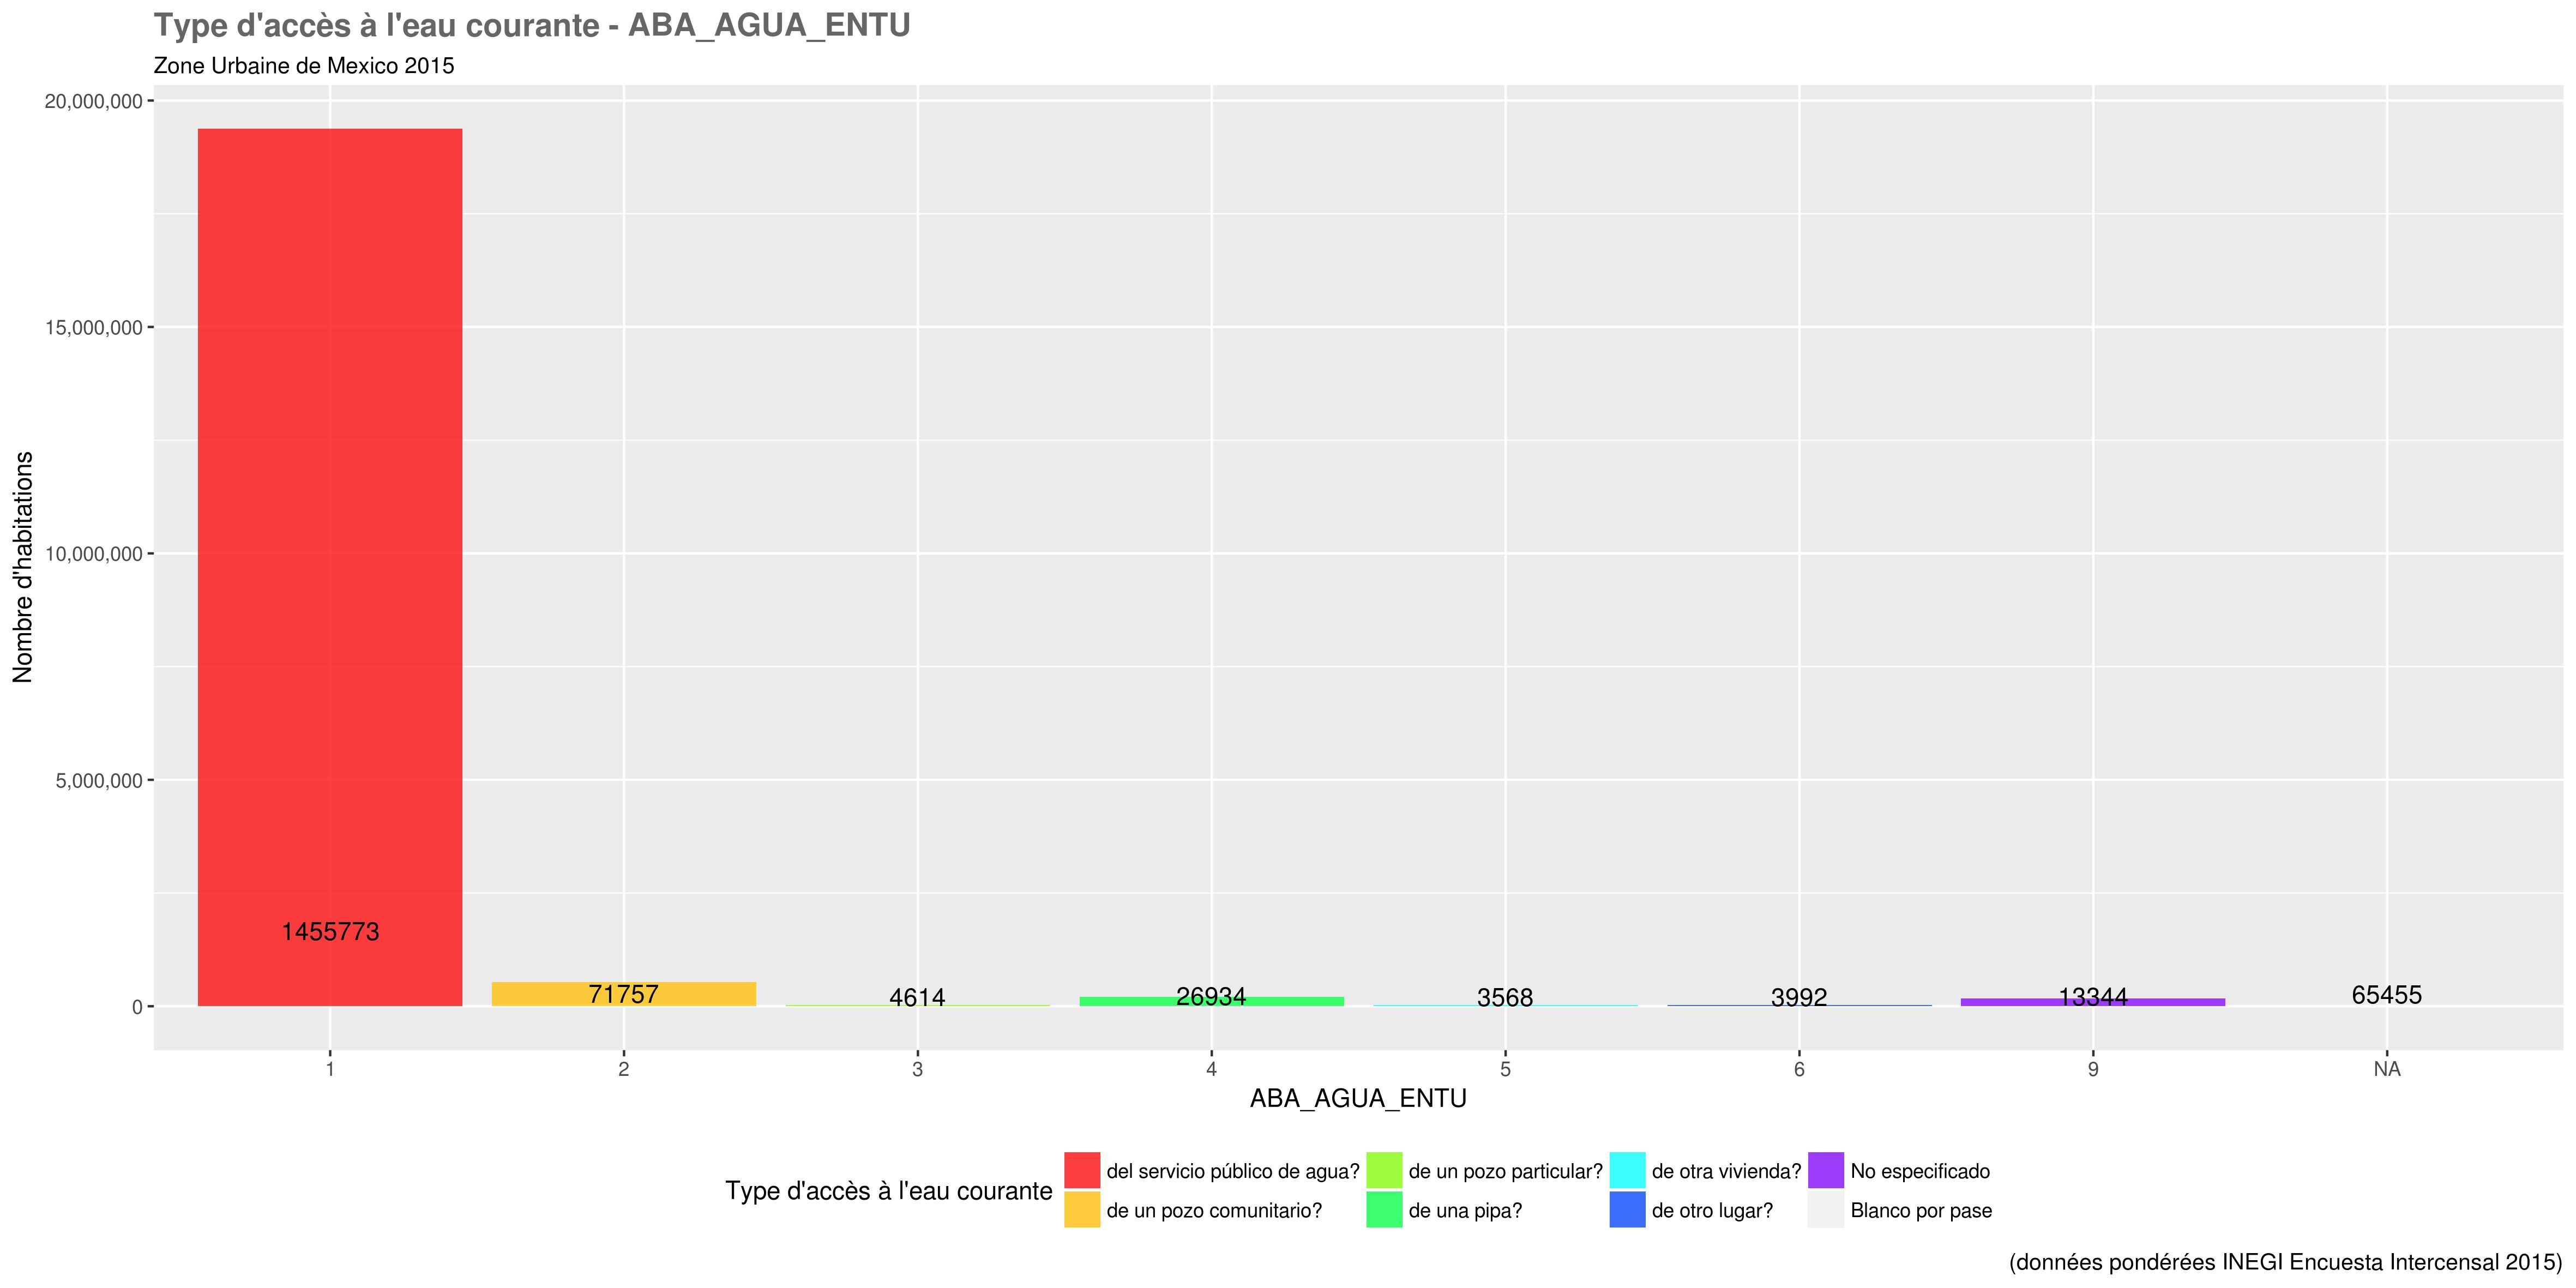 docs/images/distri_variables/ABA_AGUA_ENTU.png